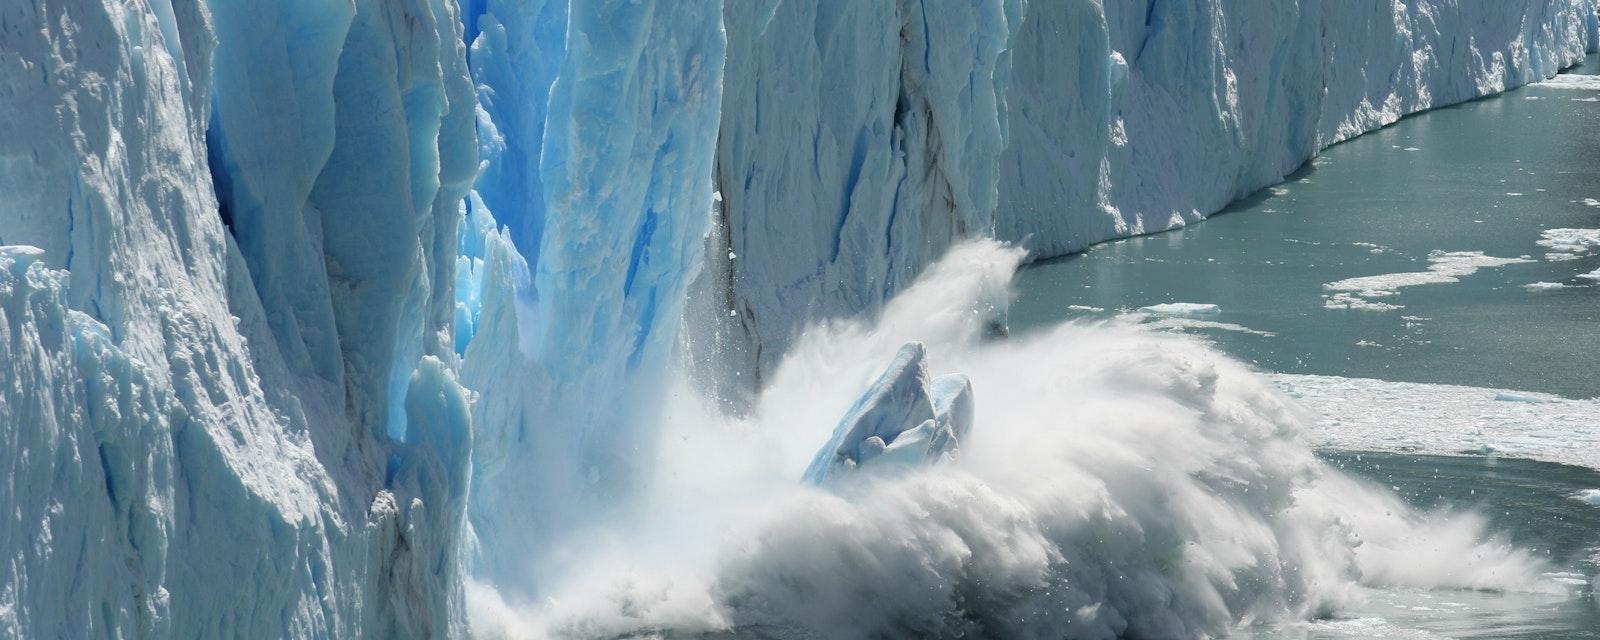 Climate,Change,-,Antarctic,Melting,Glacier,In,A,Global,Warming